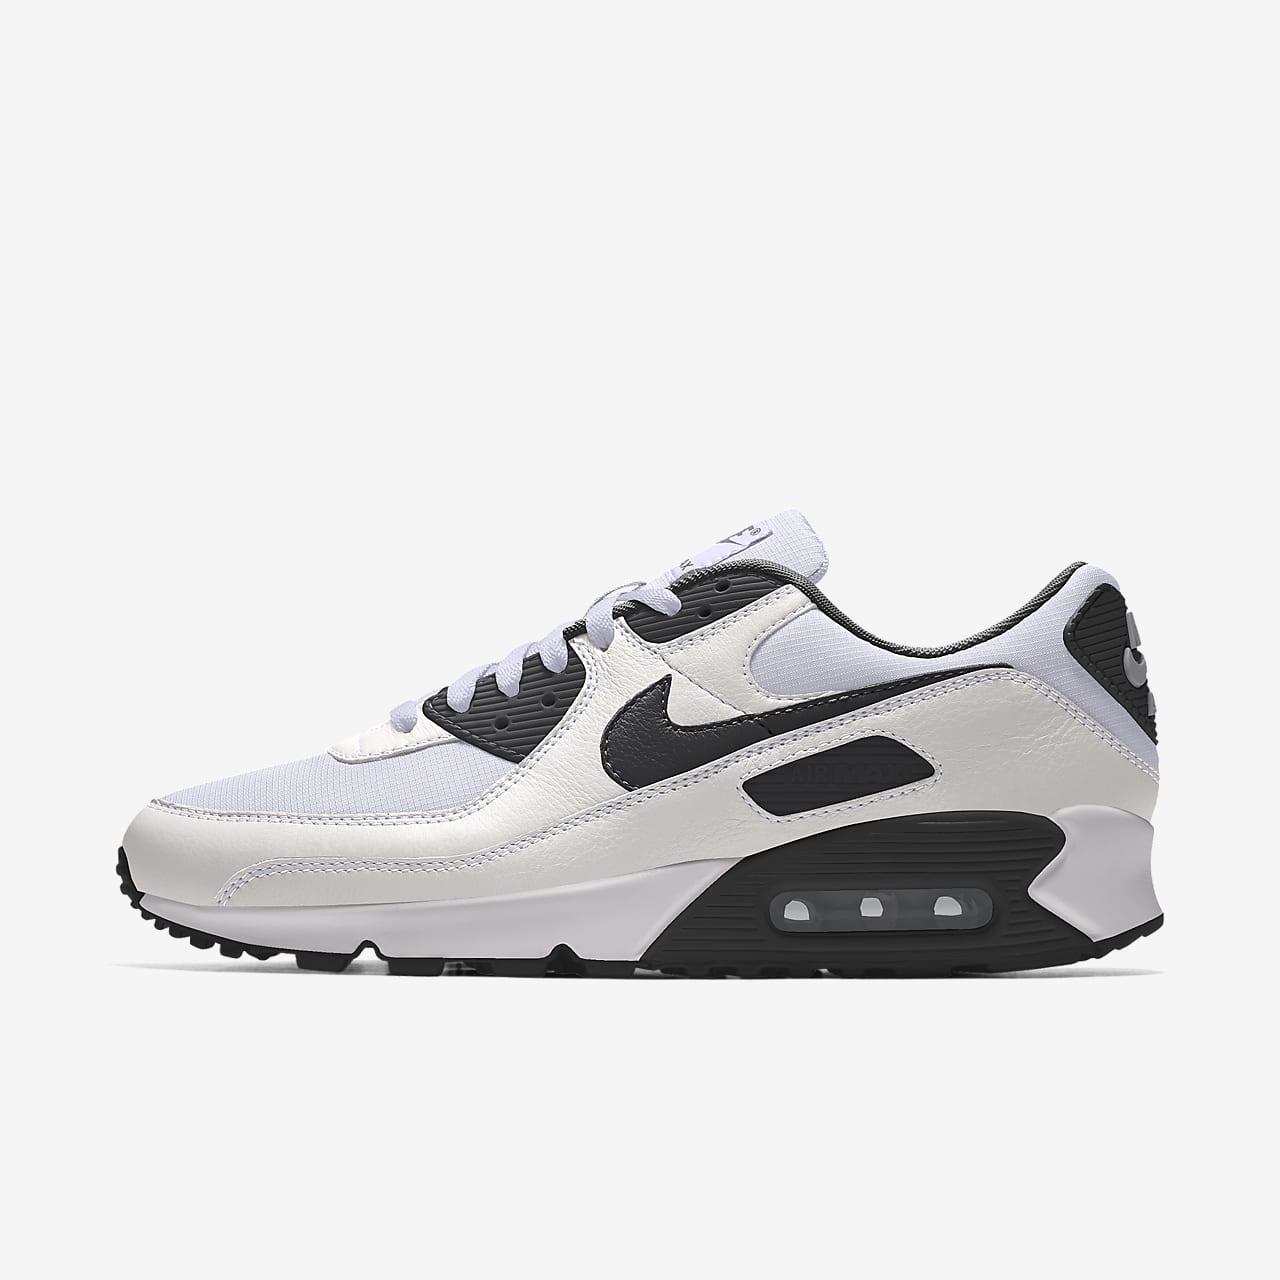 Nike Air Max 90 Unlocked By You Custom Shoe